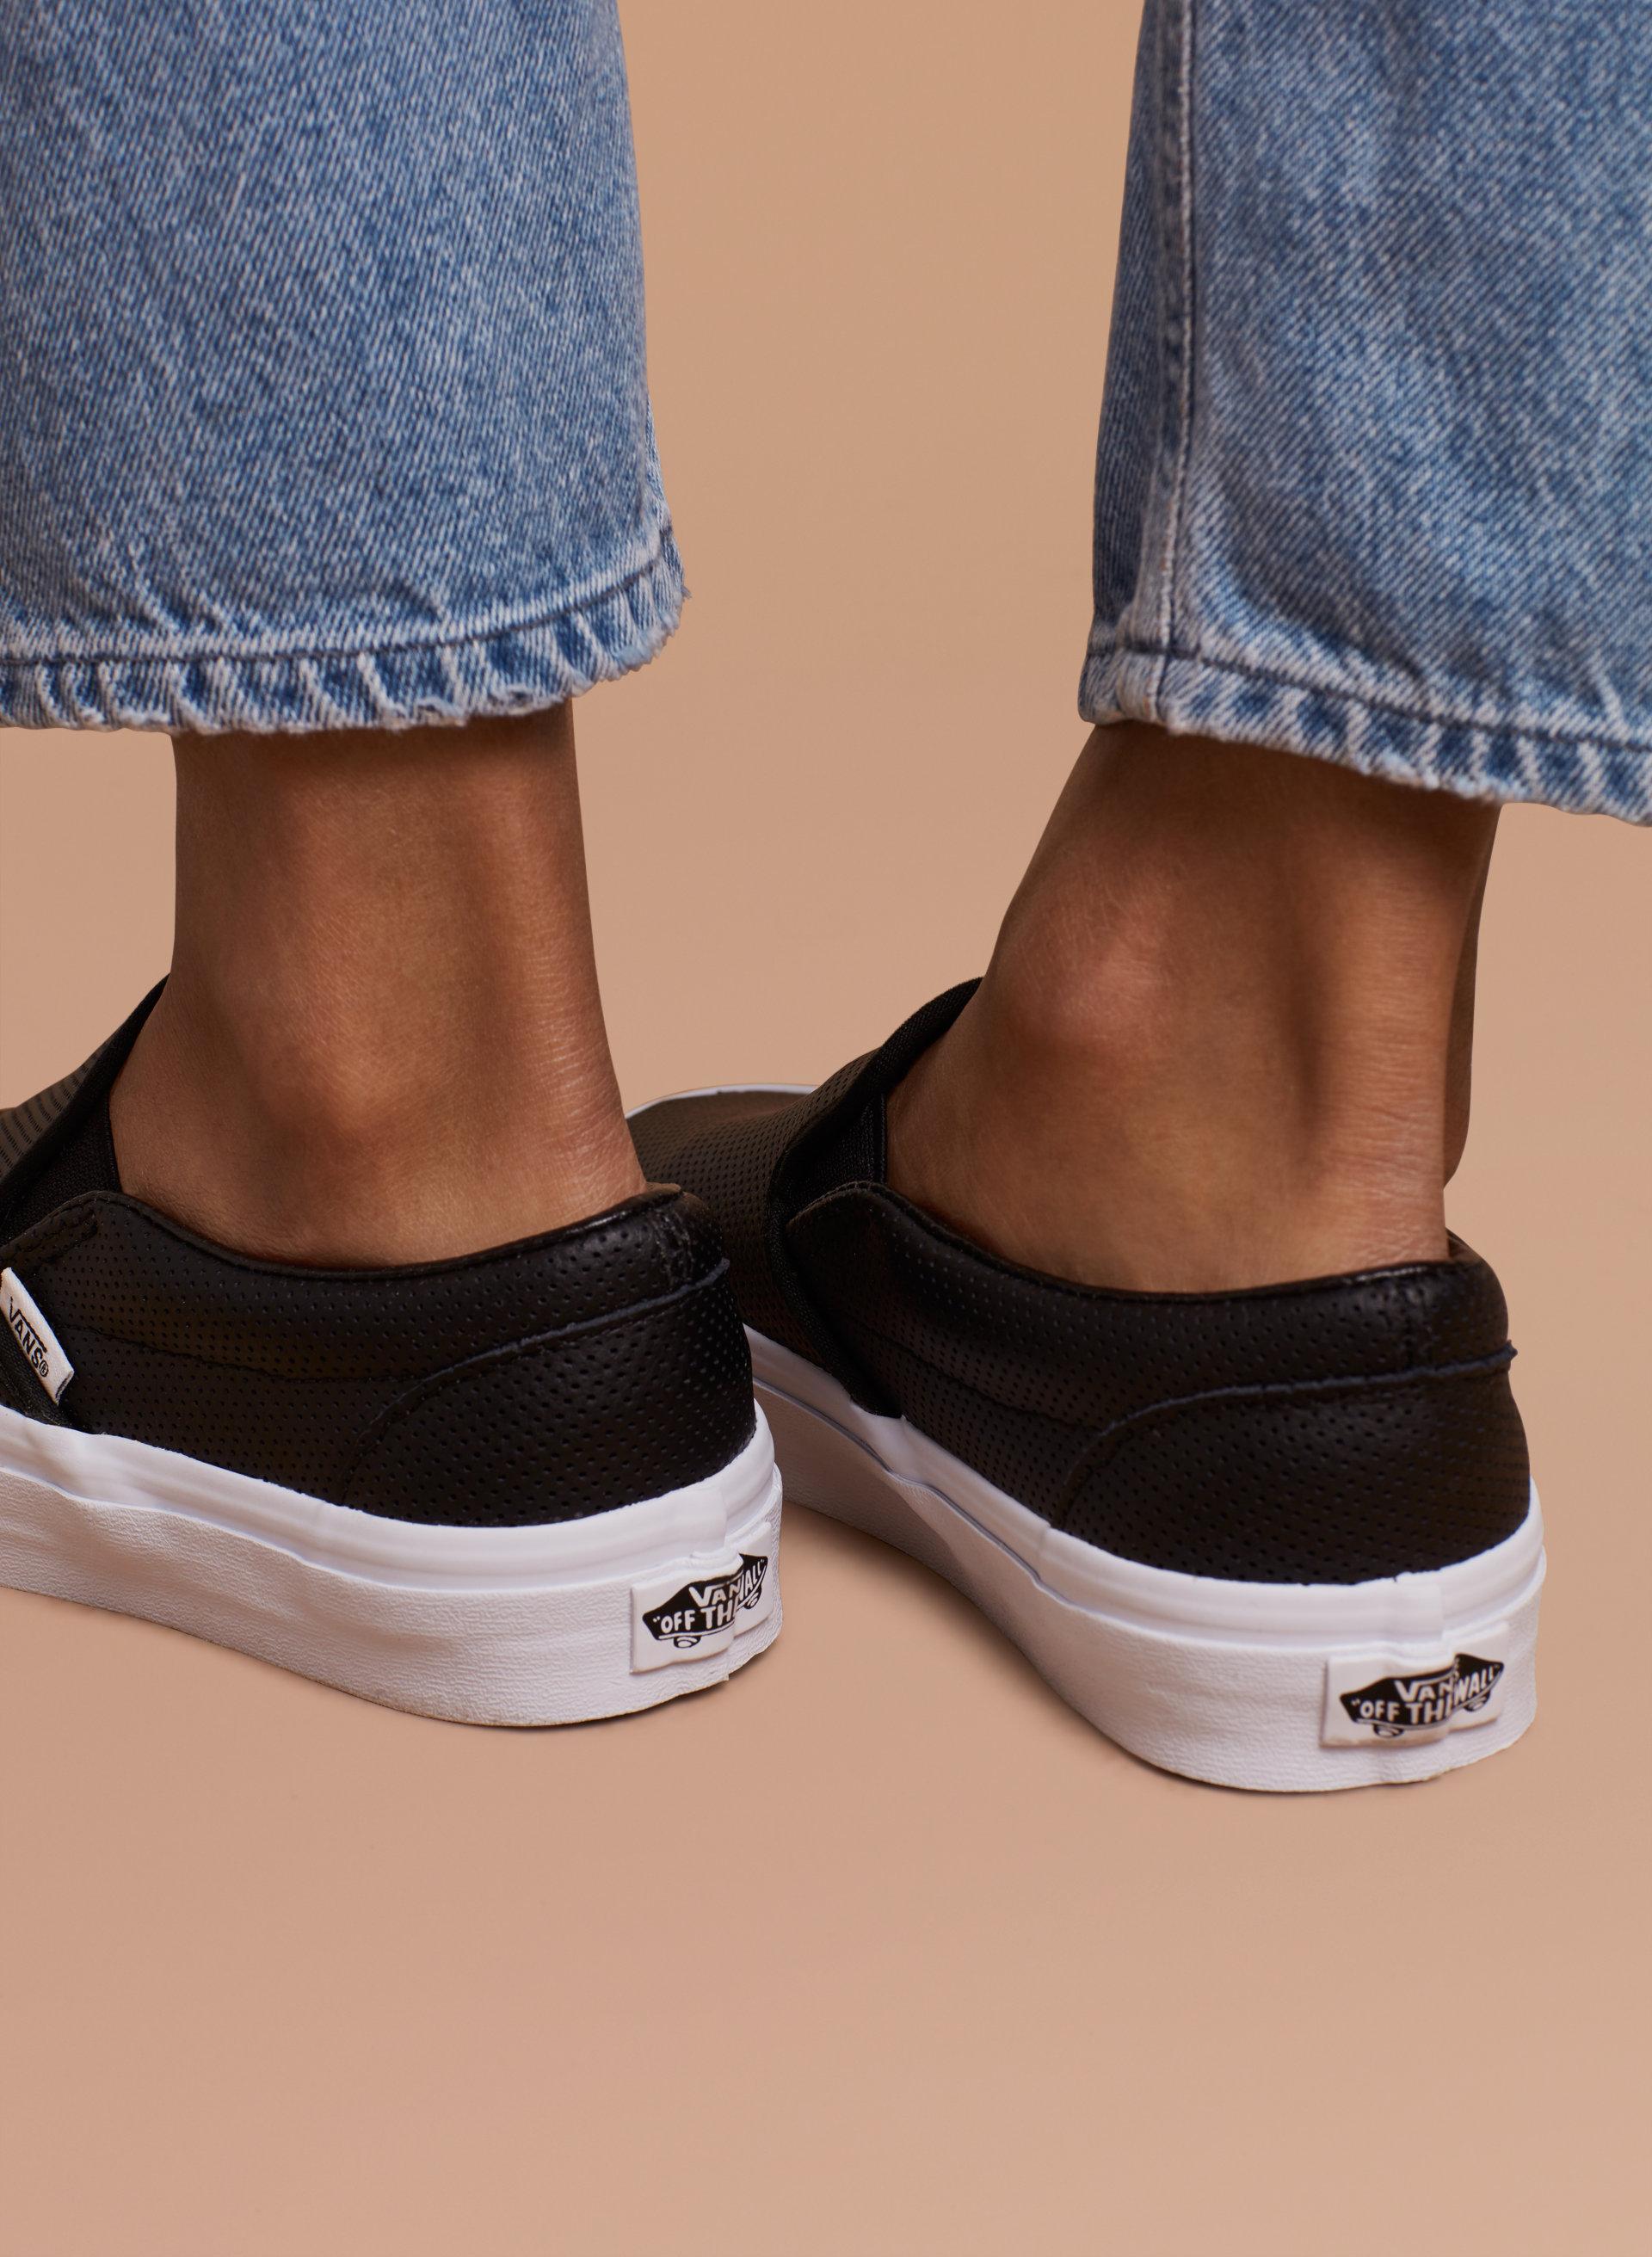 Vans slip on leather perf - Vans Slip On Perf Leather Aritzia